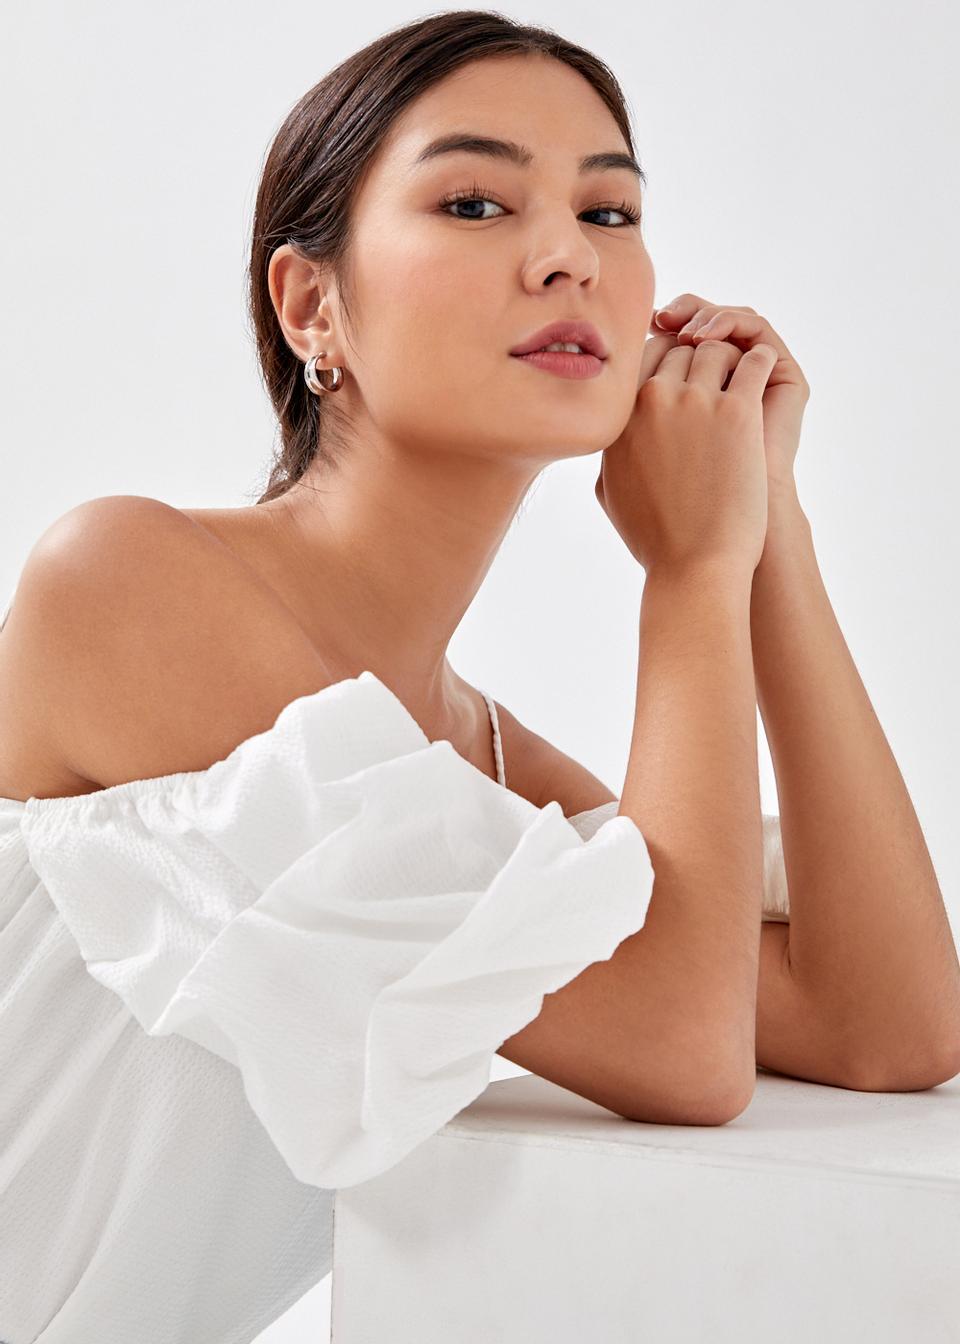 Megan Sweets | Camisole top, Fashion, Women